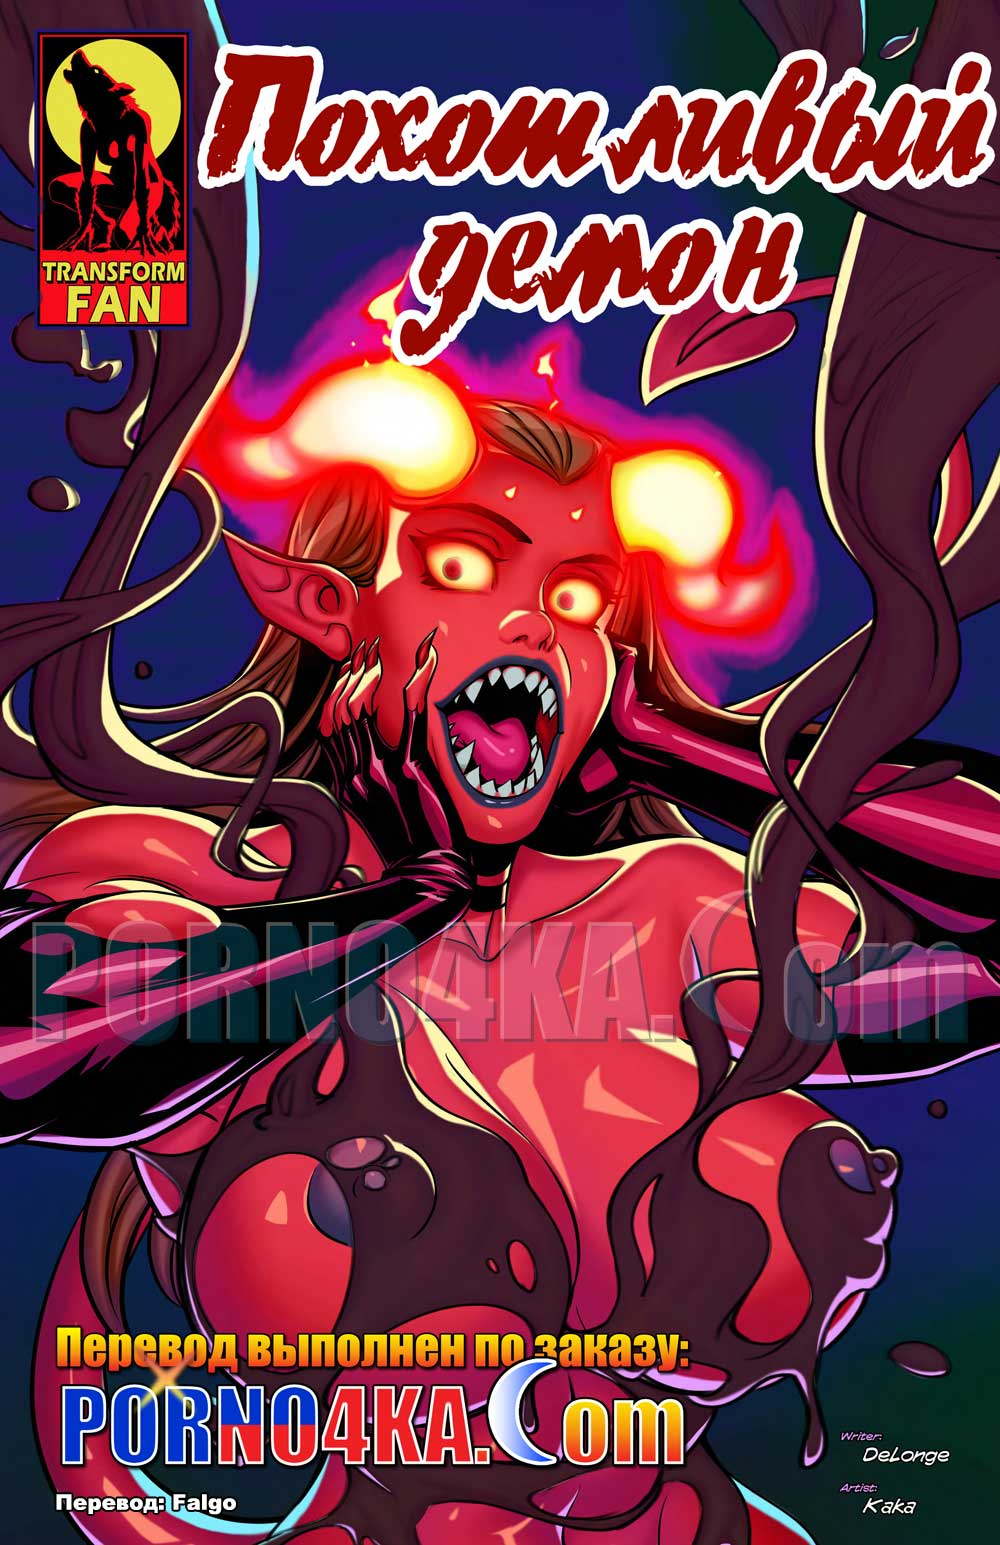 порно комикс похотливый демон